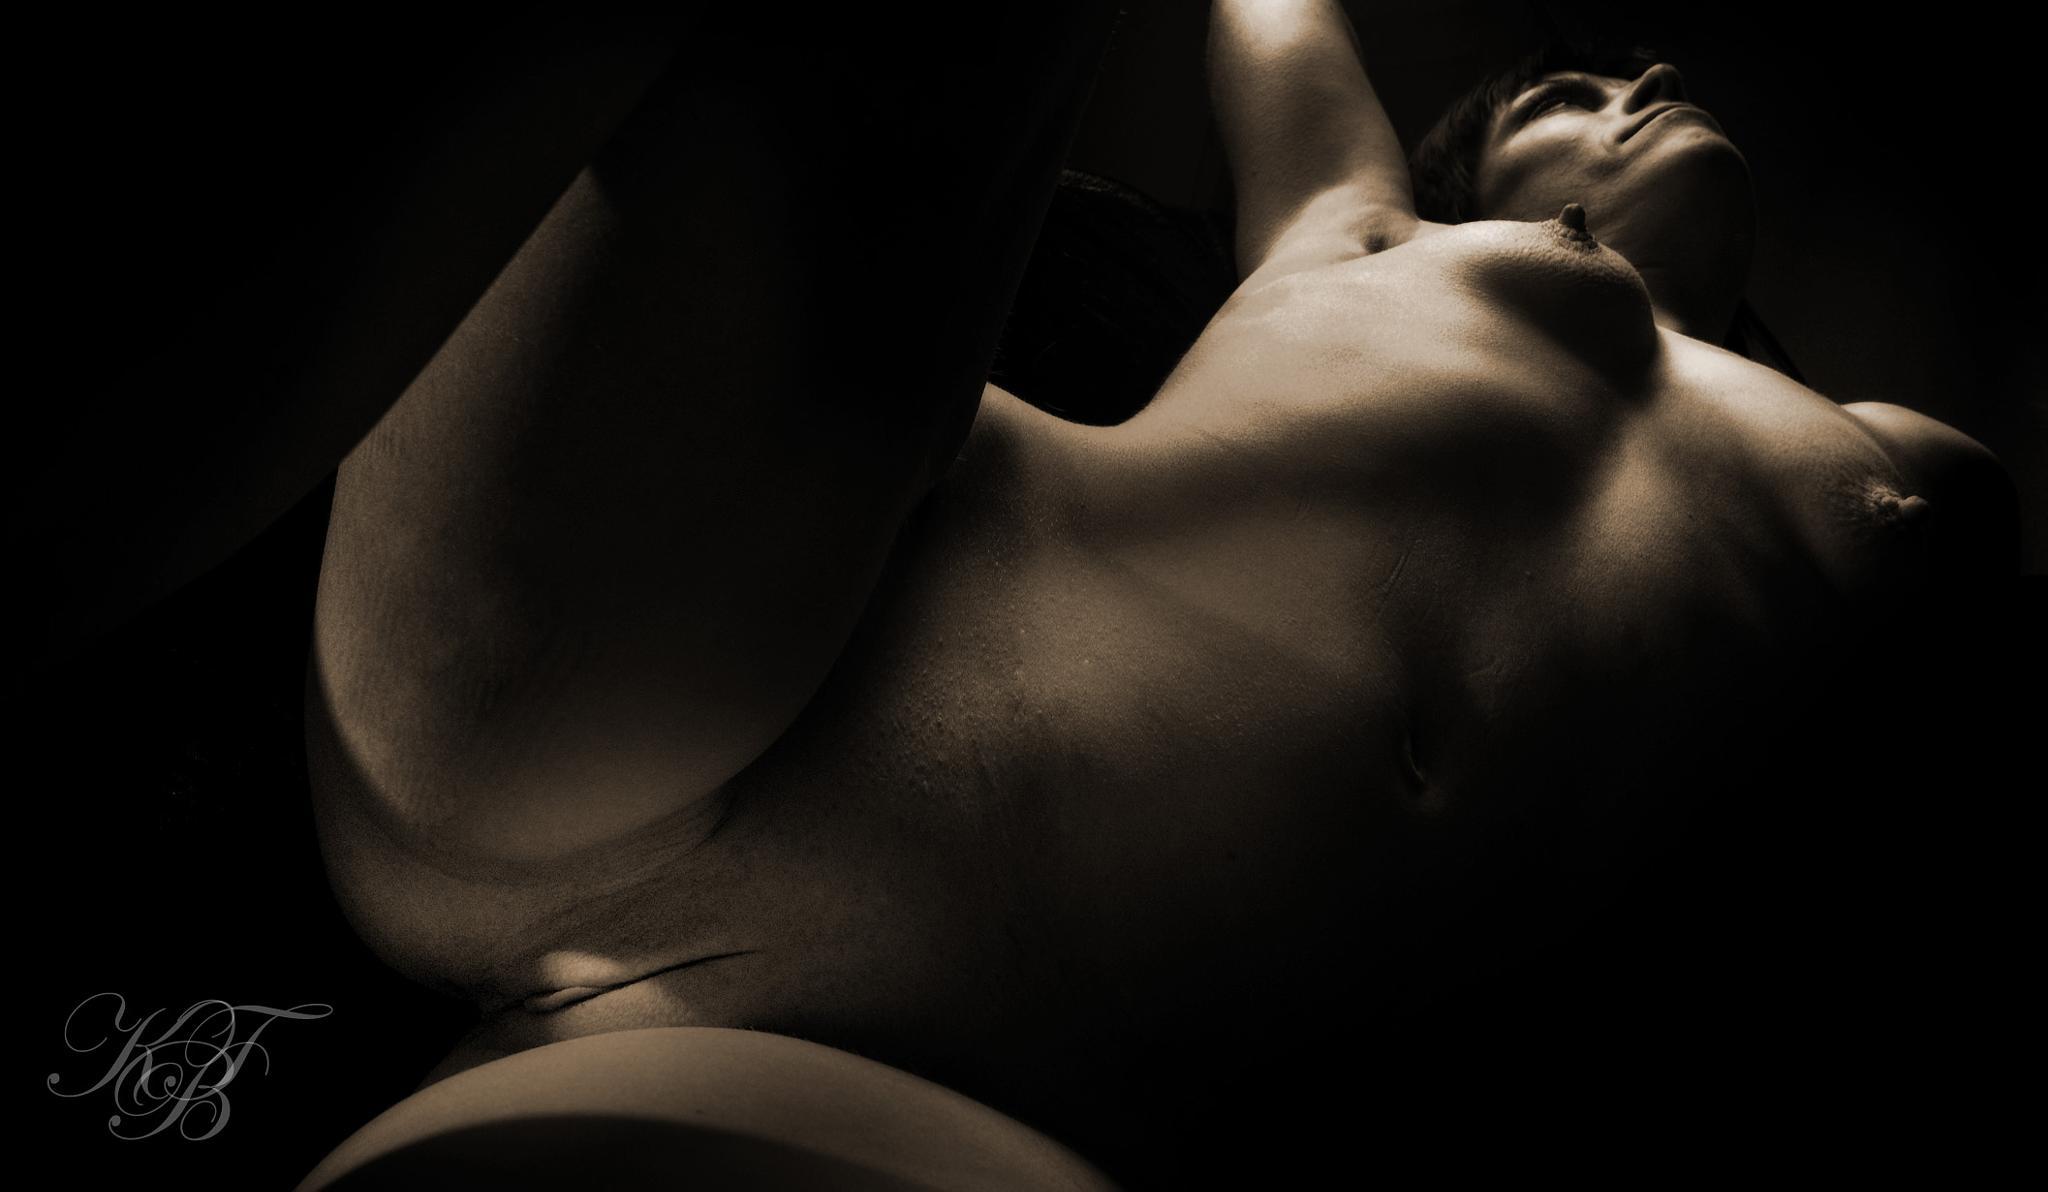 Nude by Pixforce